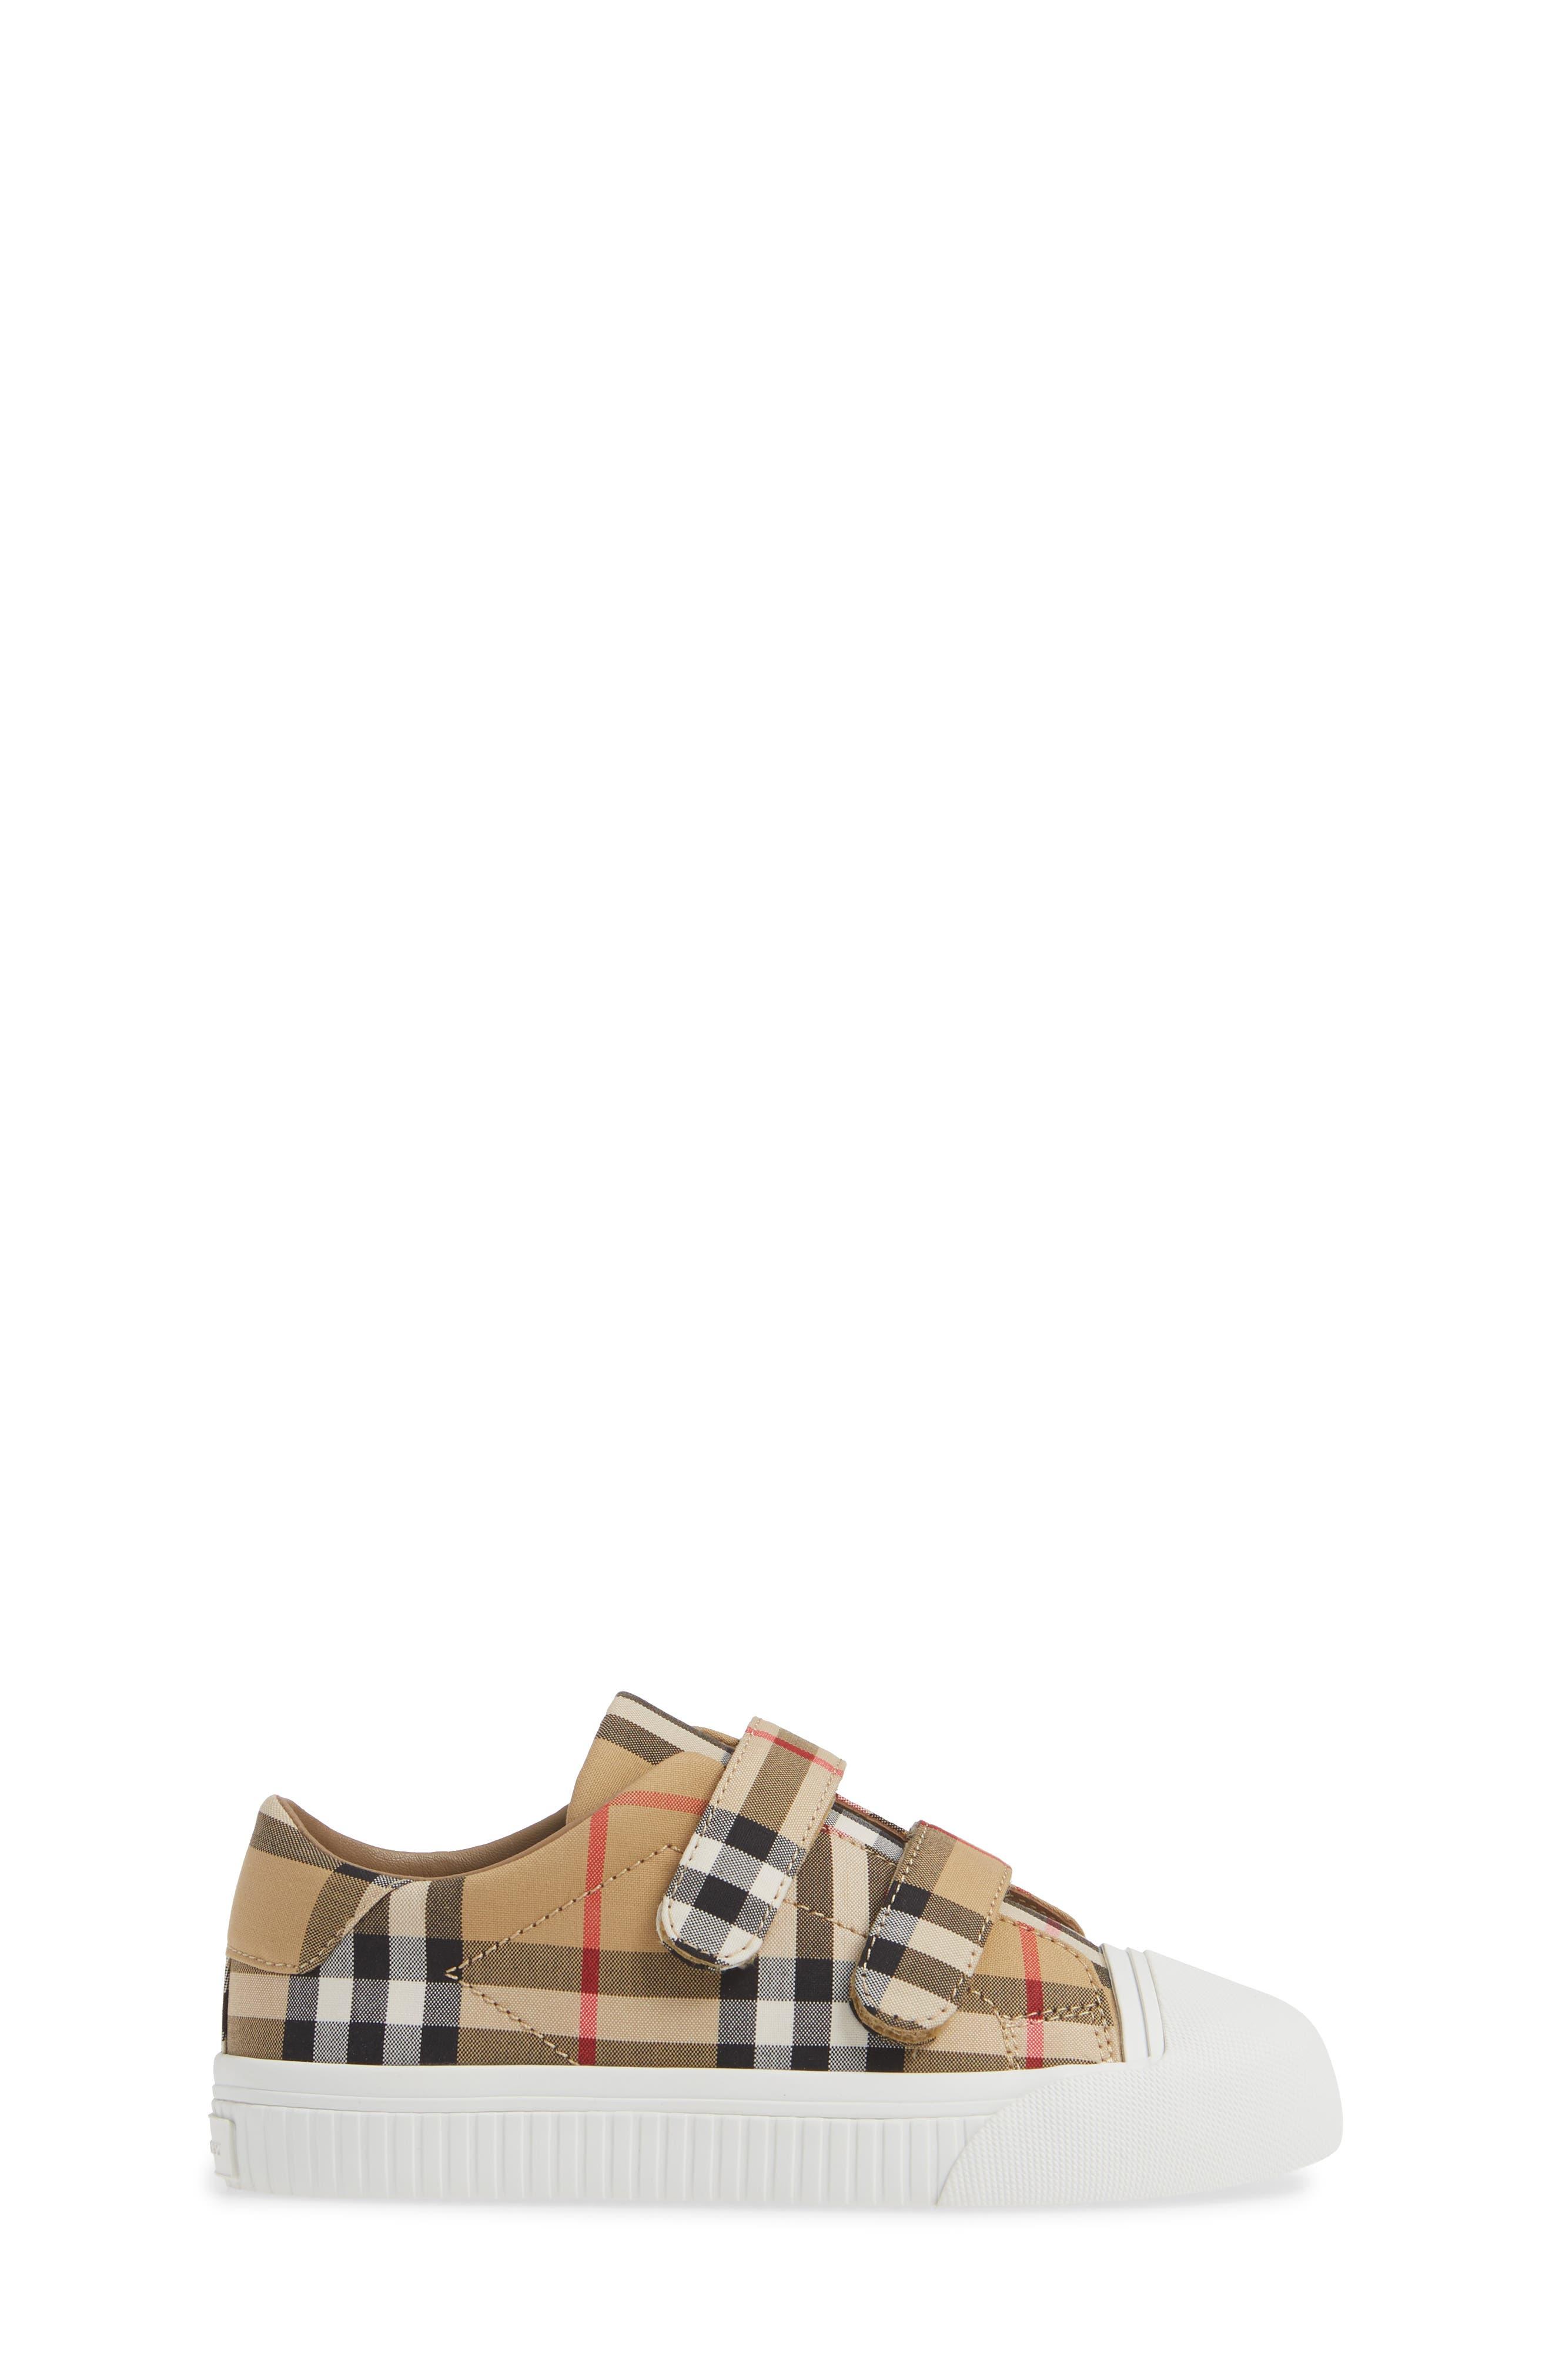 BURBERRY, Belside Sneaker, Alternate thumbnail 3, color, ANTIQUE YELLOW-OPTIC WHITE